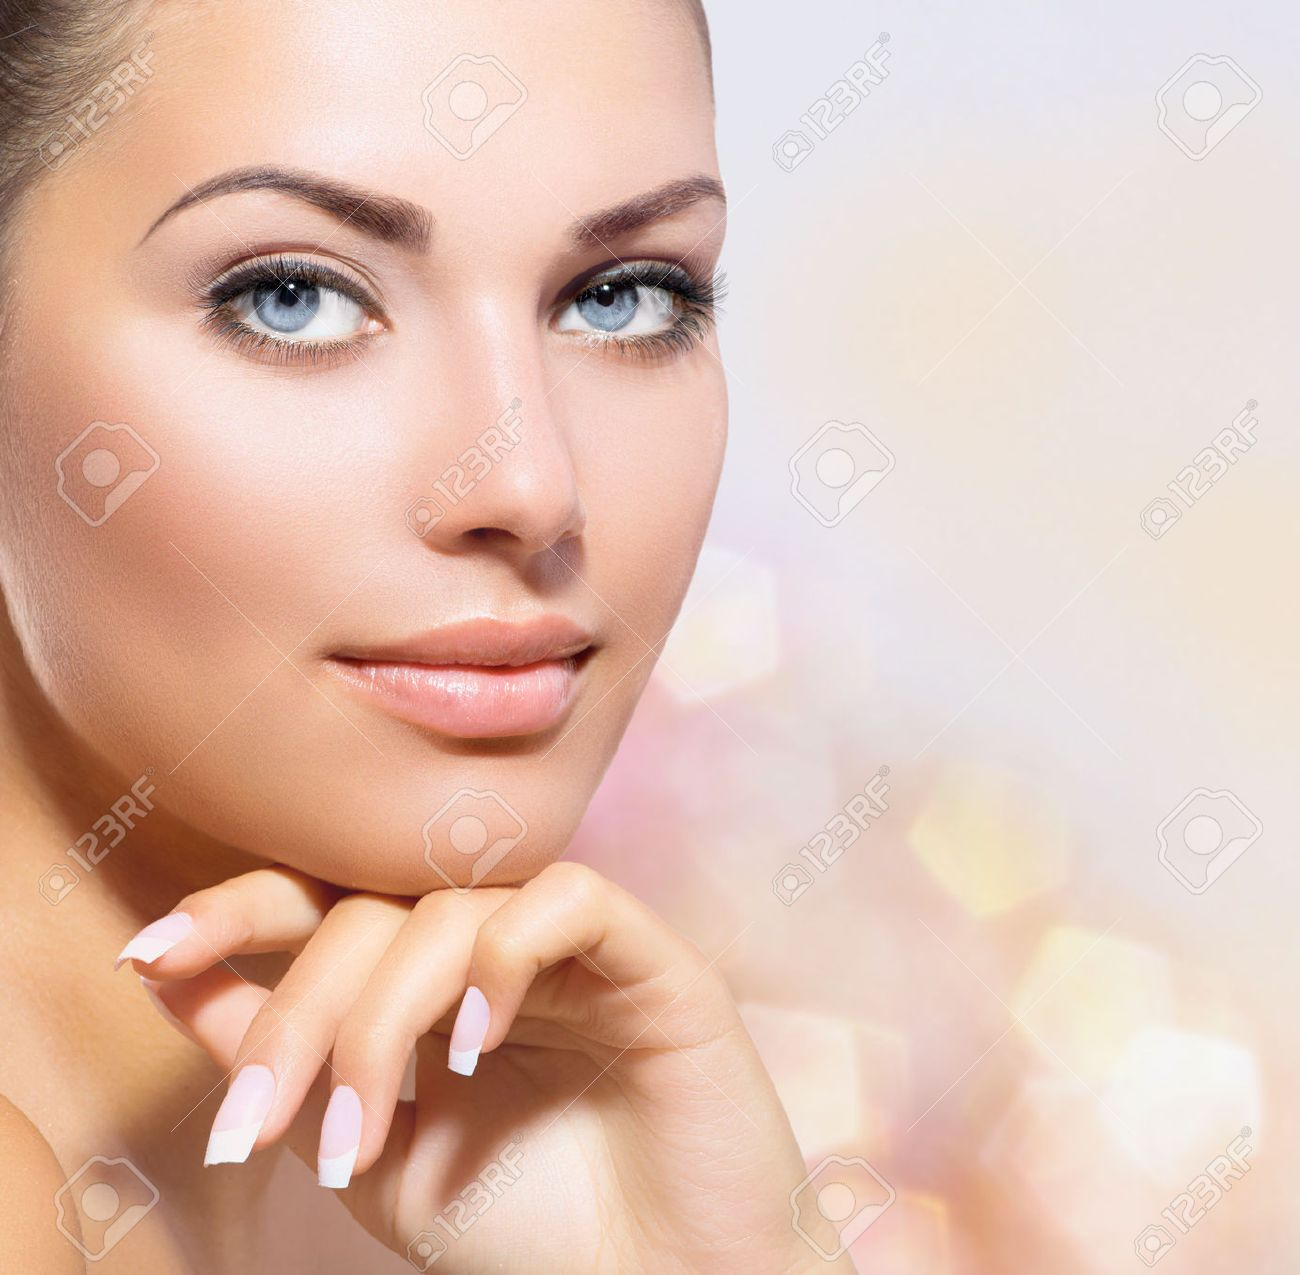 Beauty Portrait  Beautiful Spa Woman Touching her Face Stock Photo - 23735972